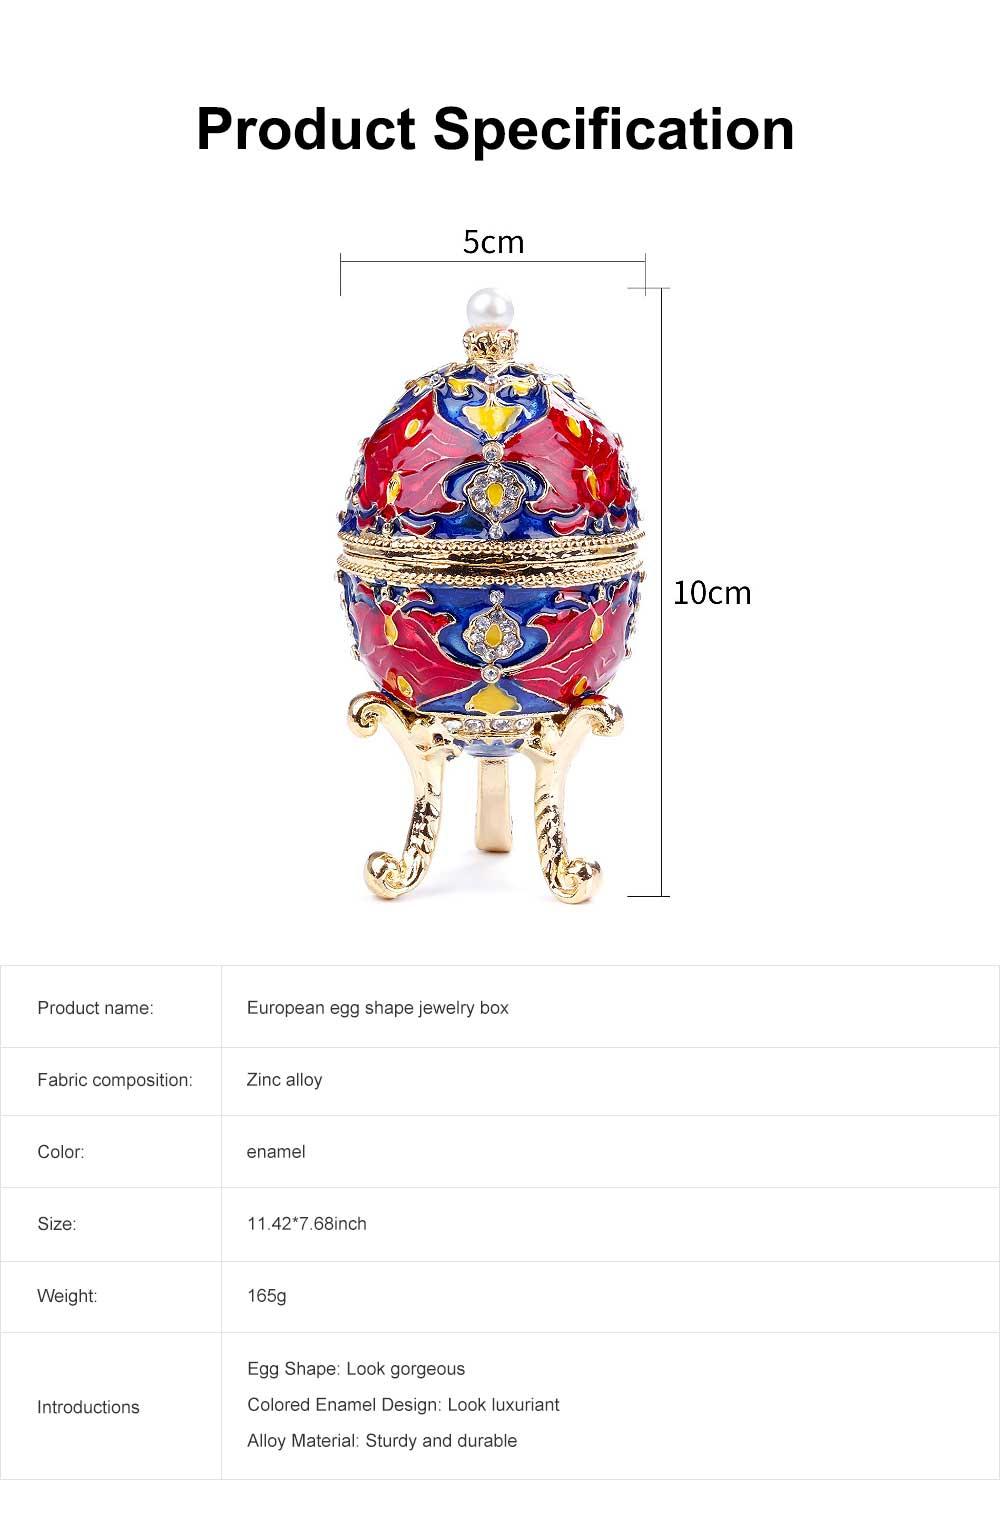 European Egg Shape Jewelry Box, Luxuriant Colored Enamel Trinket Keepsake Storage Box Collection Holder 6